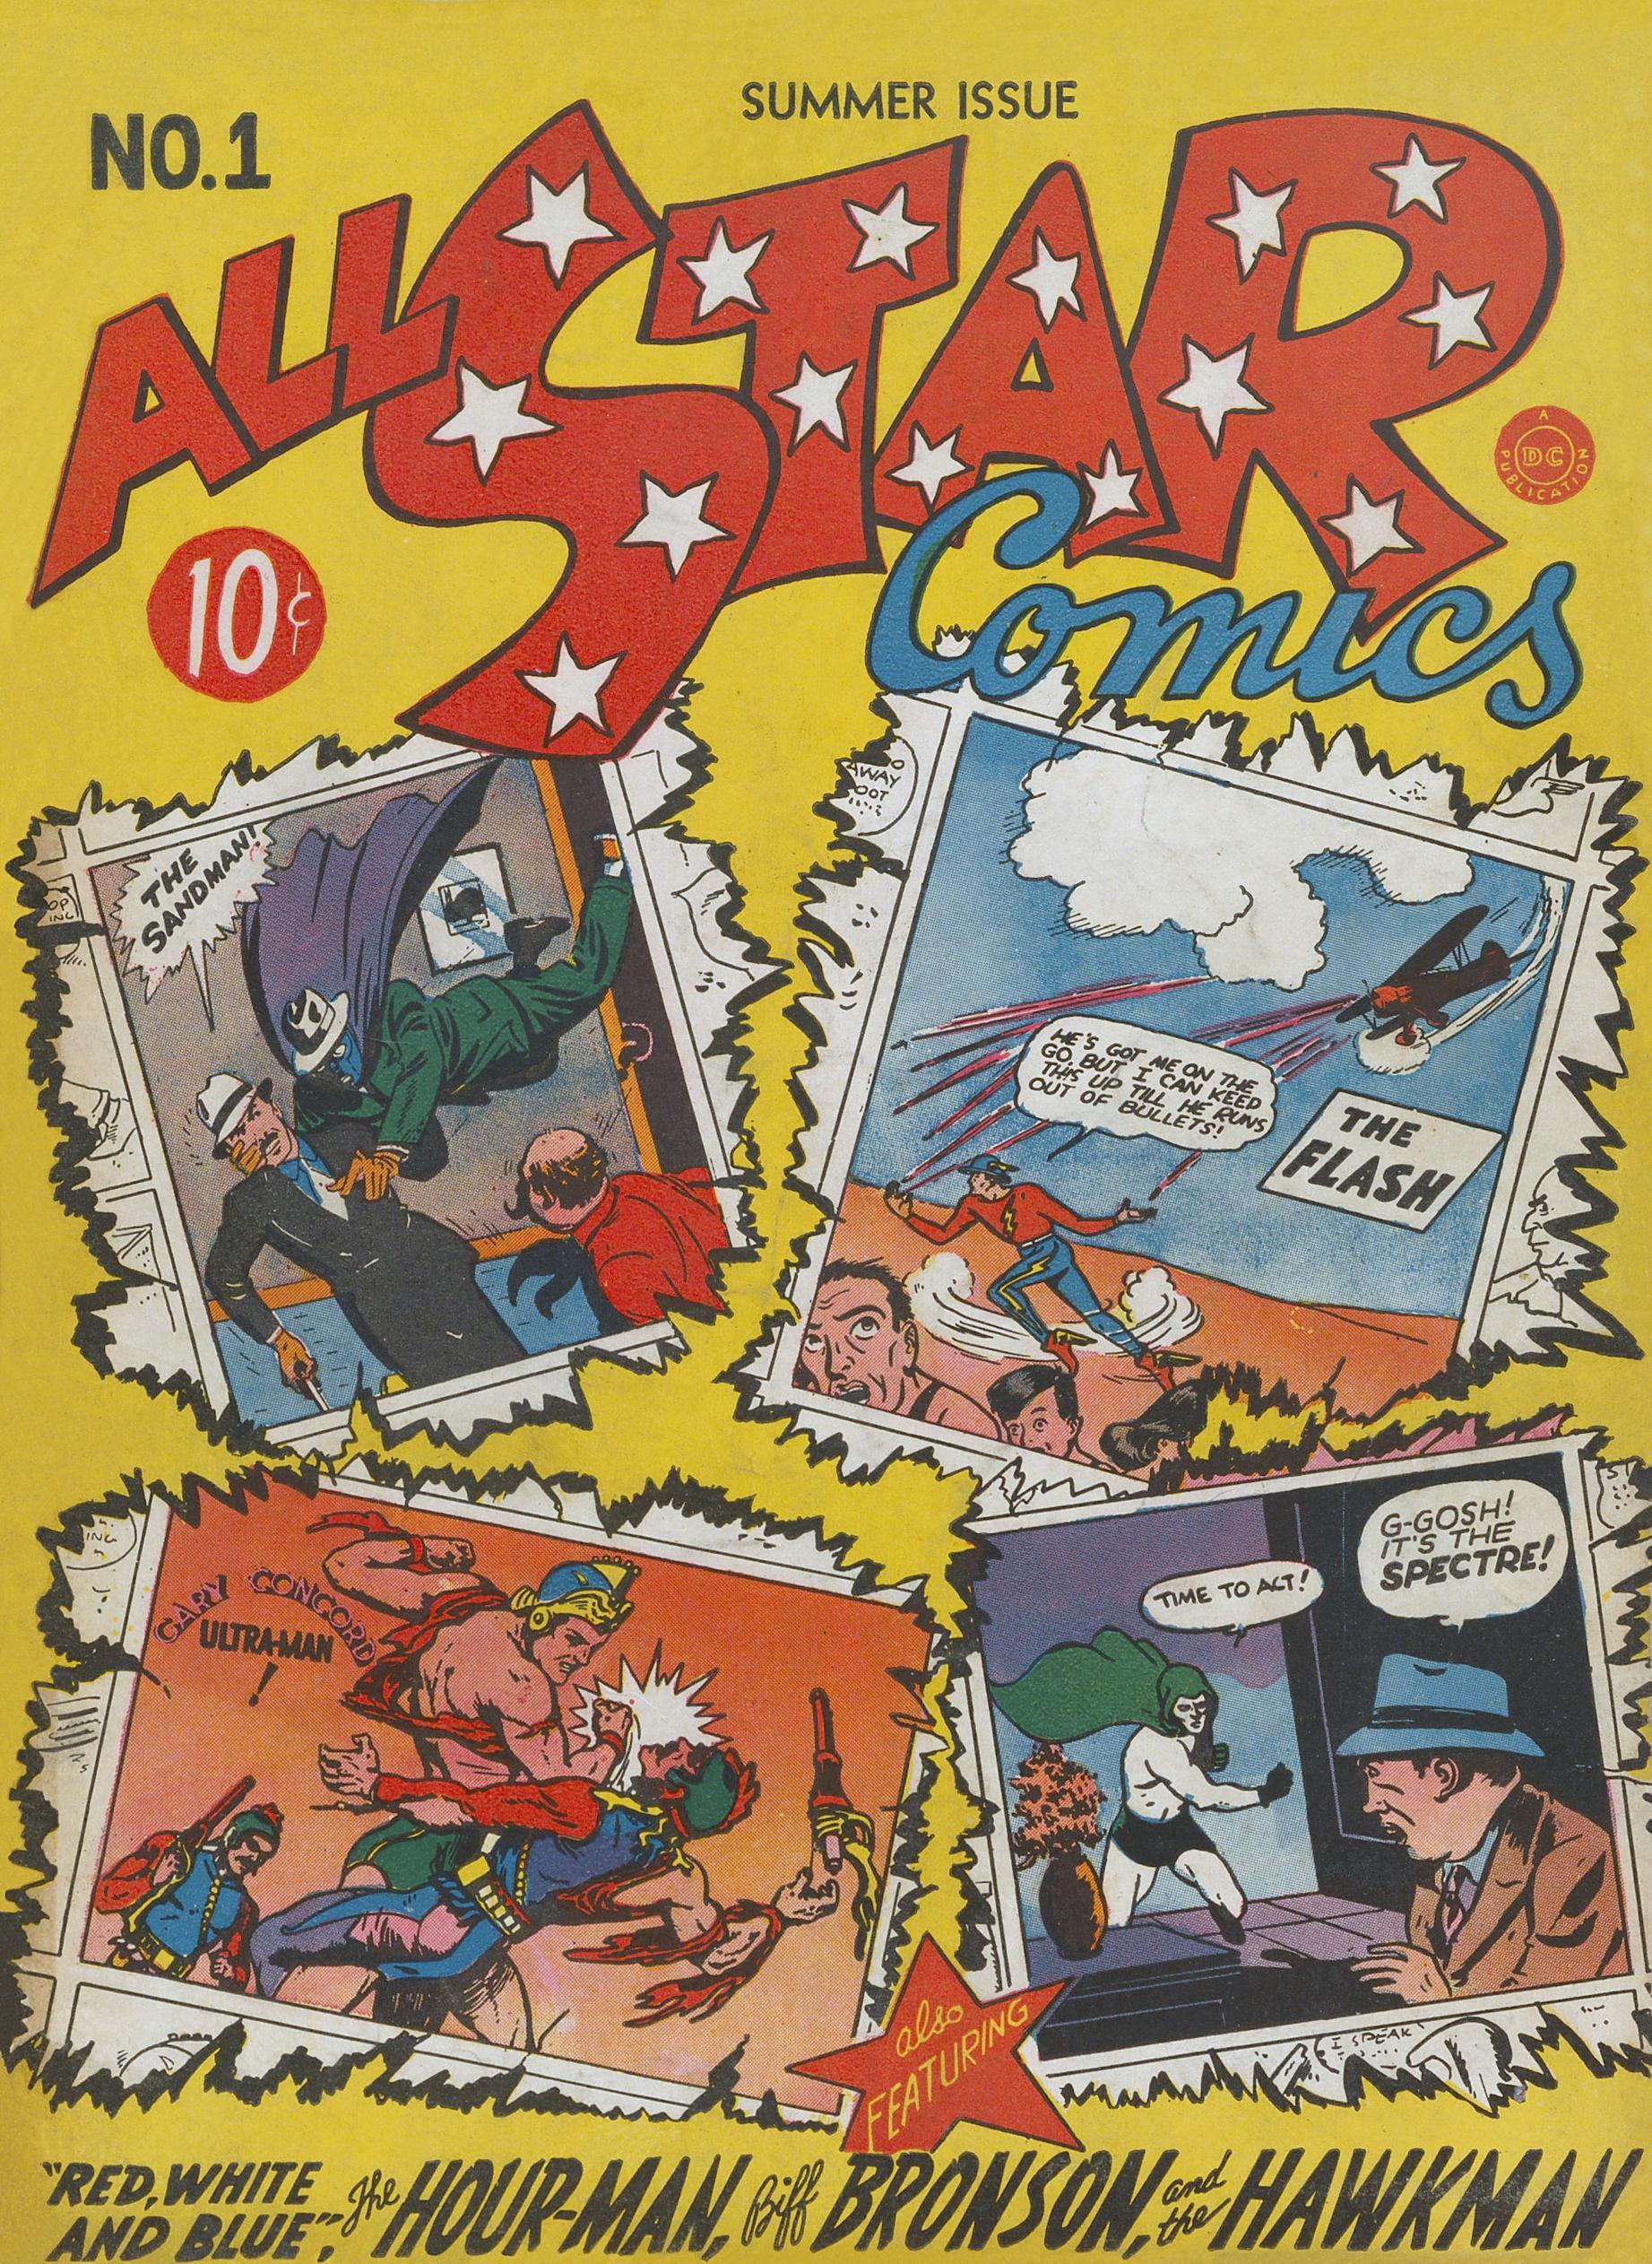 All-Star Comics 01 (DC) (1940 Summer)